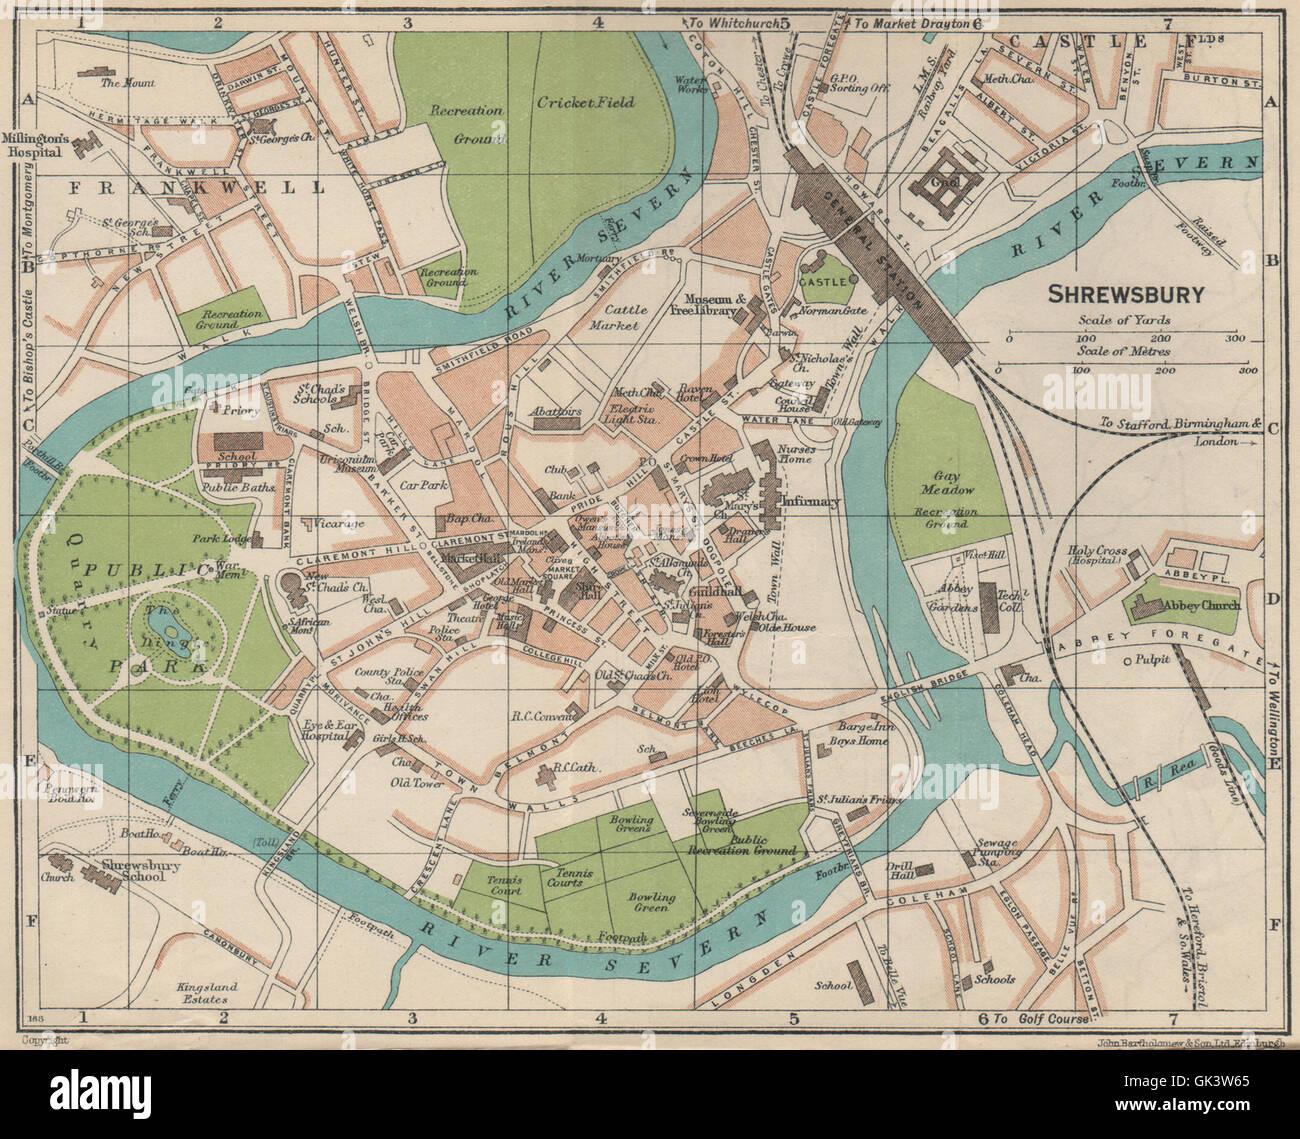 SHREWSBURY. Vintage town city map plan. Shropshire, 1939 Stock Photo ...